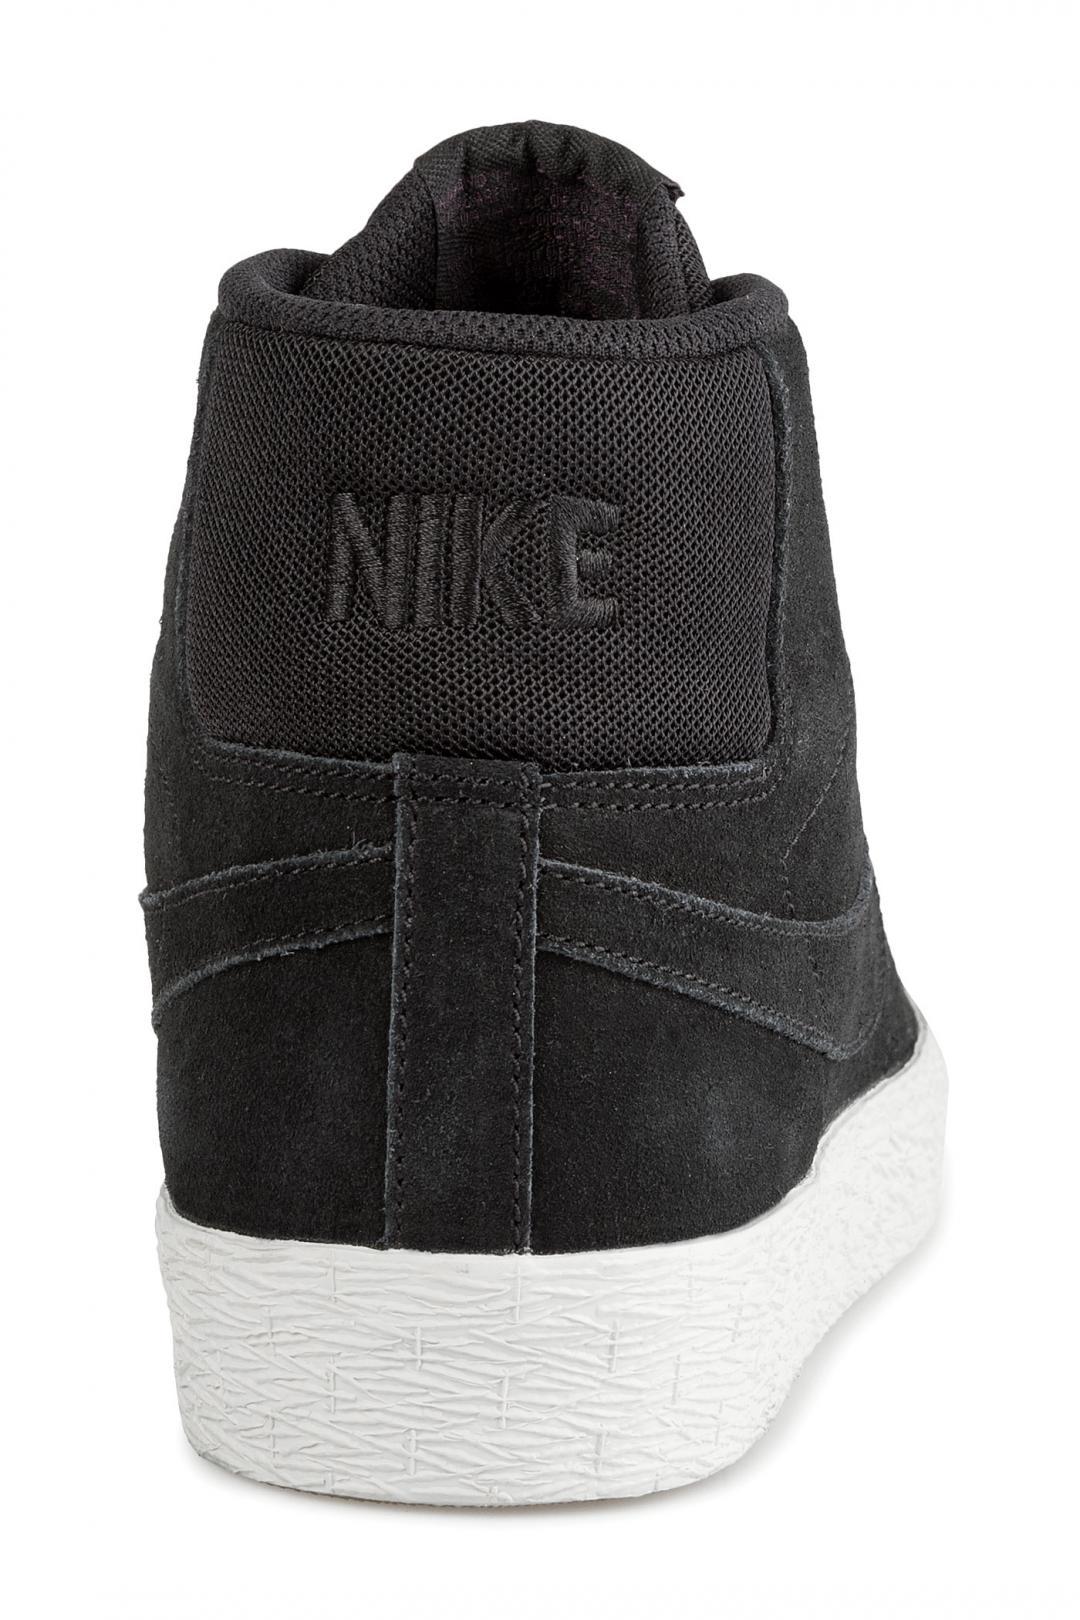 Uomo Nike SB Zoom Blazer Mid Deconstructed black pro purple   Scarpe da skate